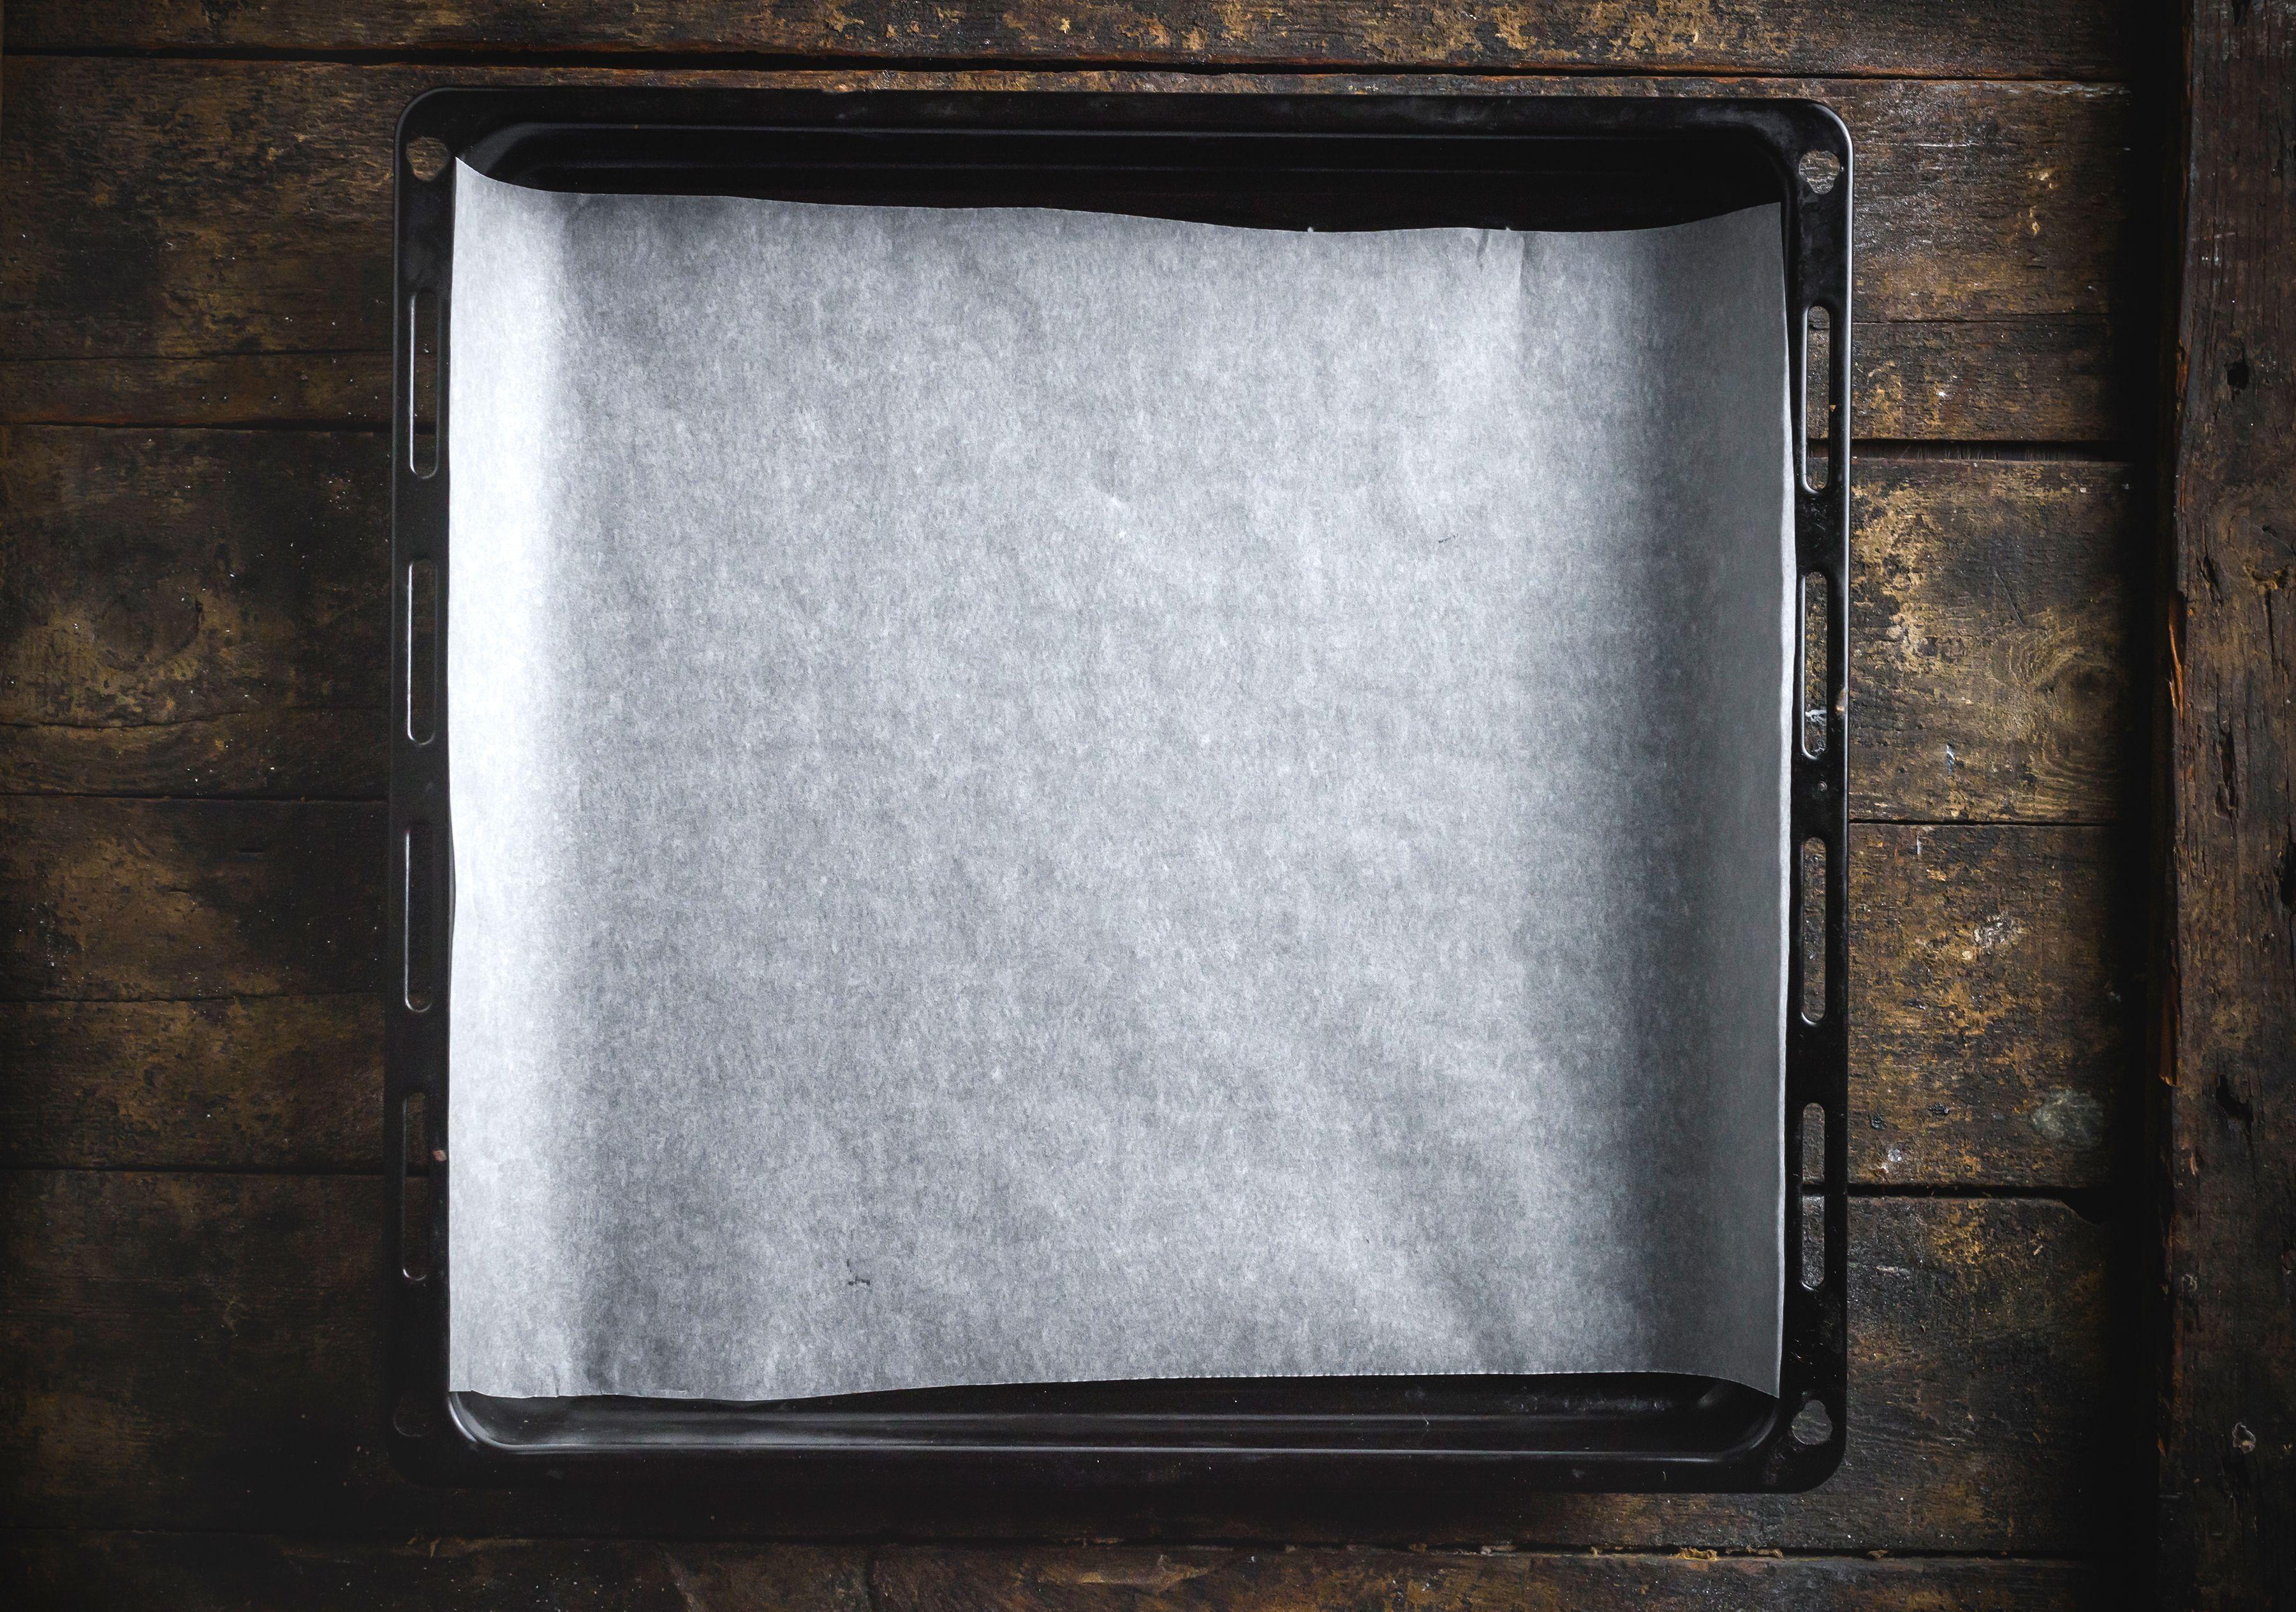 Lightly grease baking sheet